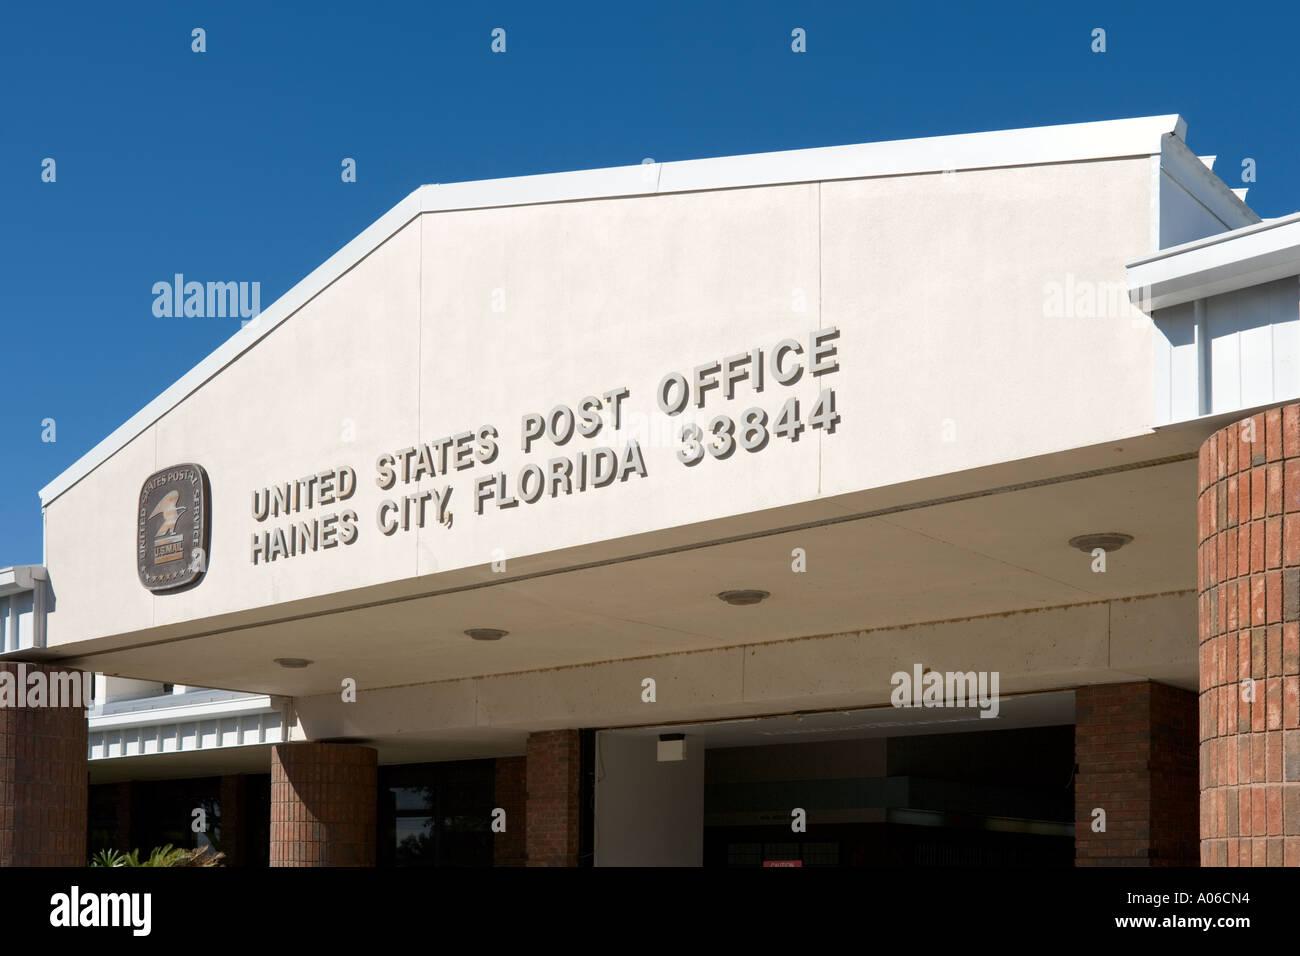 Entrance to Post Office, Unites States Postal Service, Haines City, Florida, USA - Stock Image